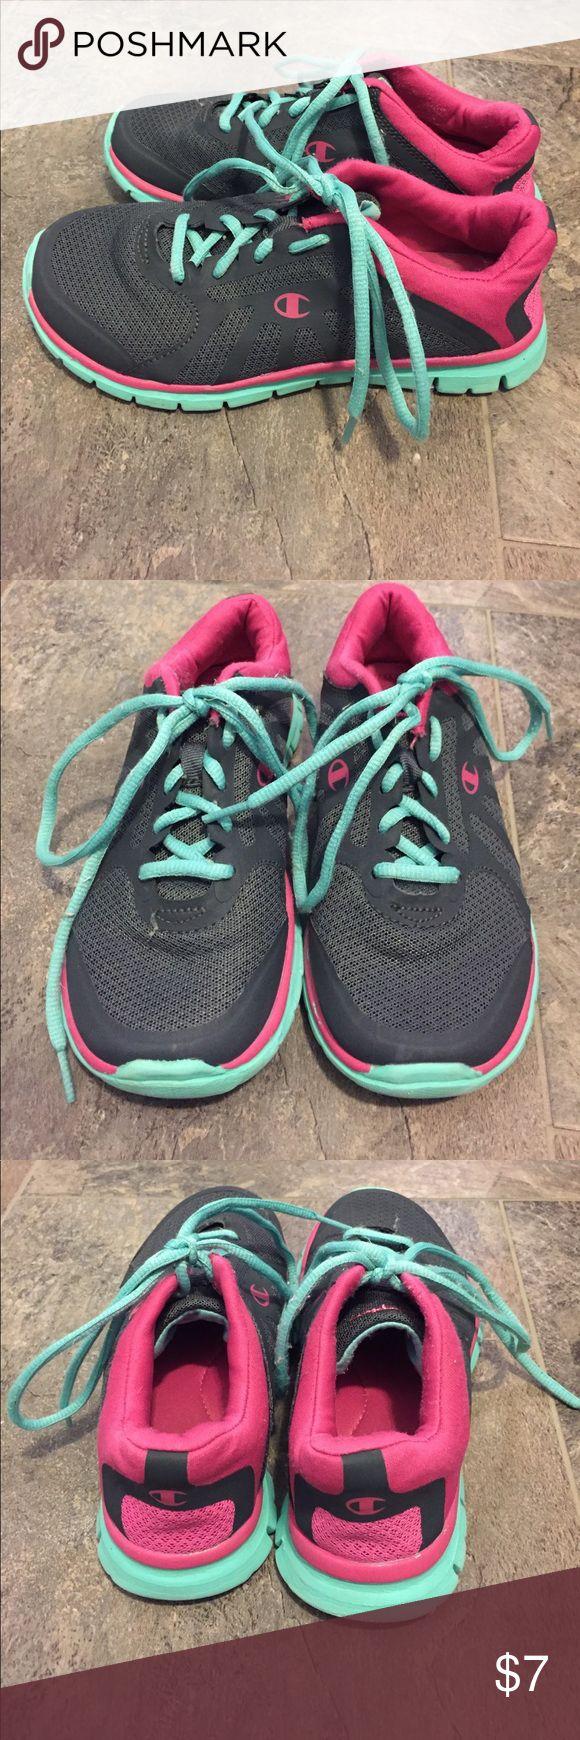 Girls champion shoes Super comfortable sneakers Champion Shoes Sneakers